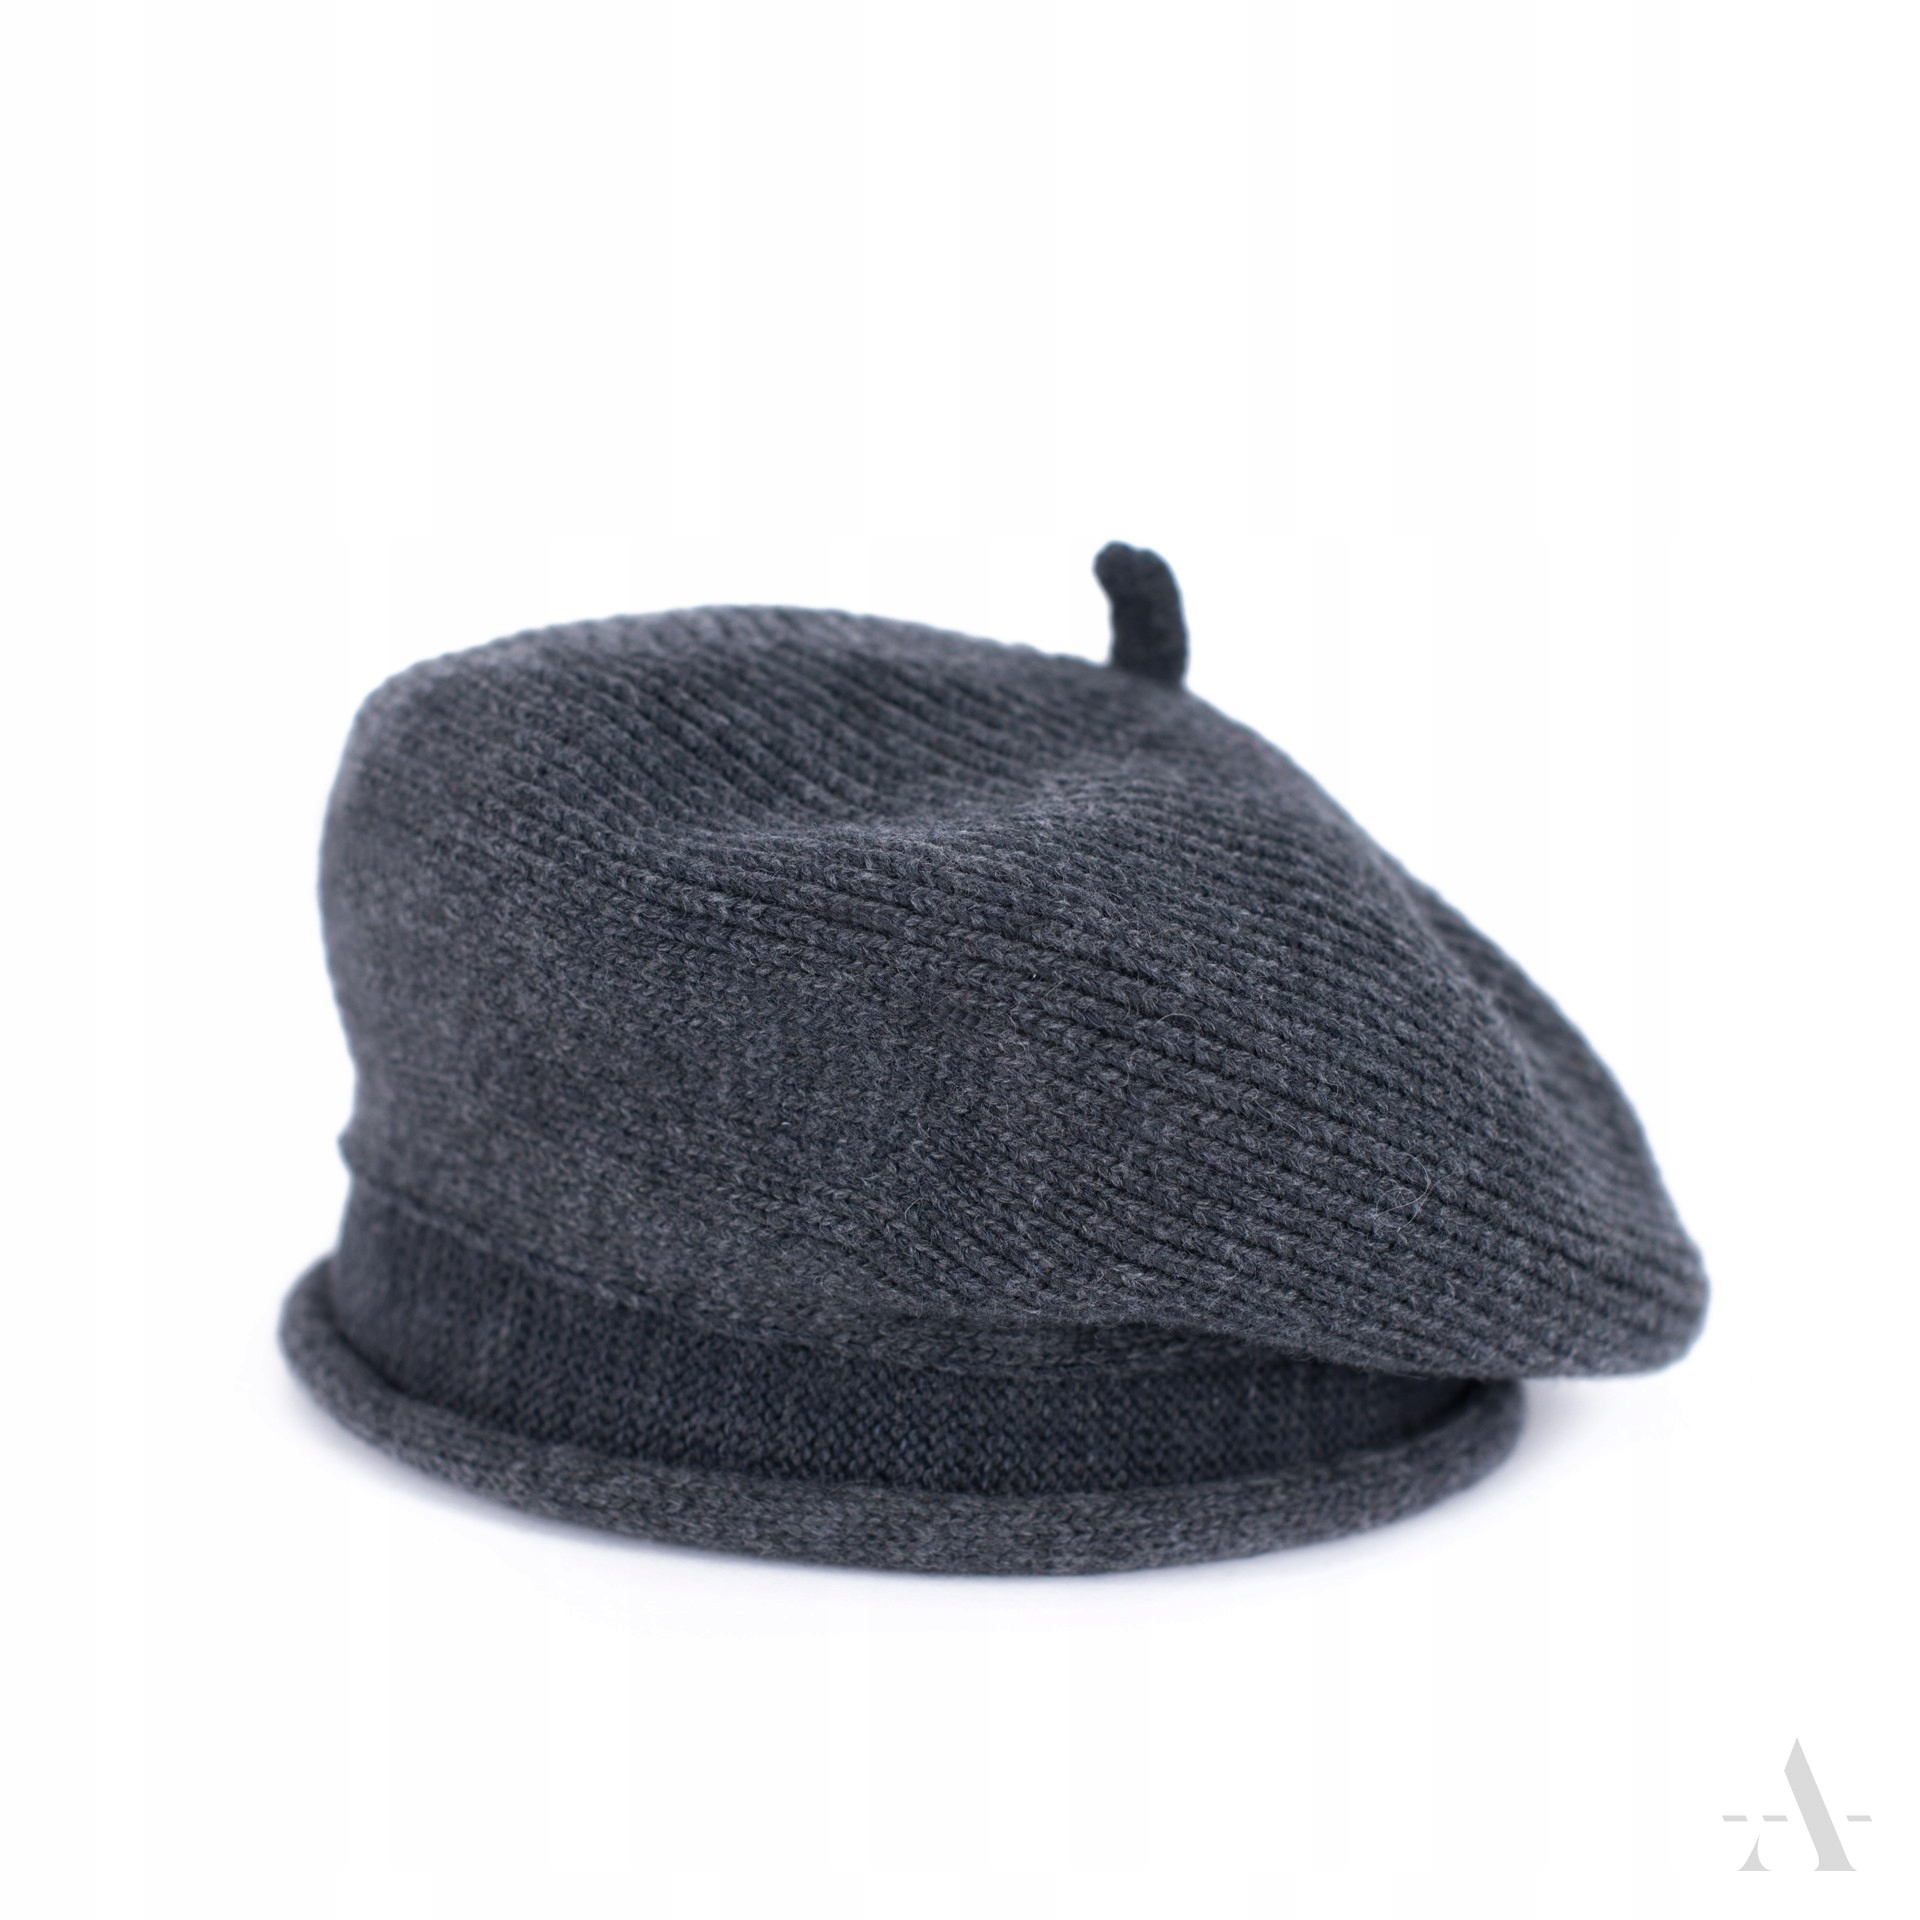 Dámsky baret WOOL Elegantný prémiový retro LUX!